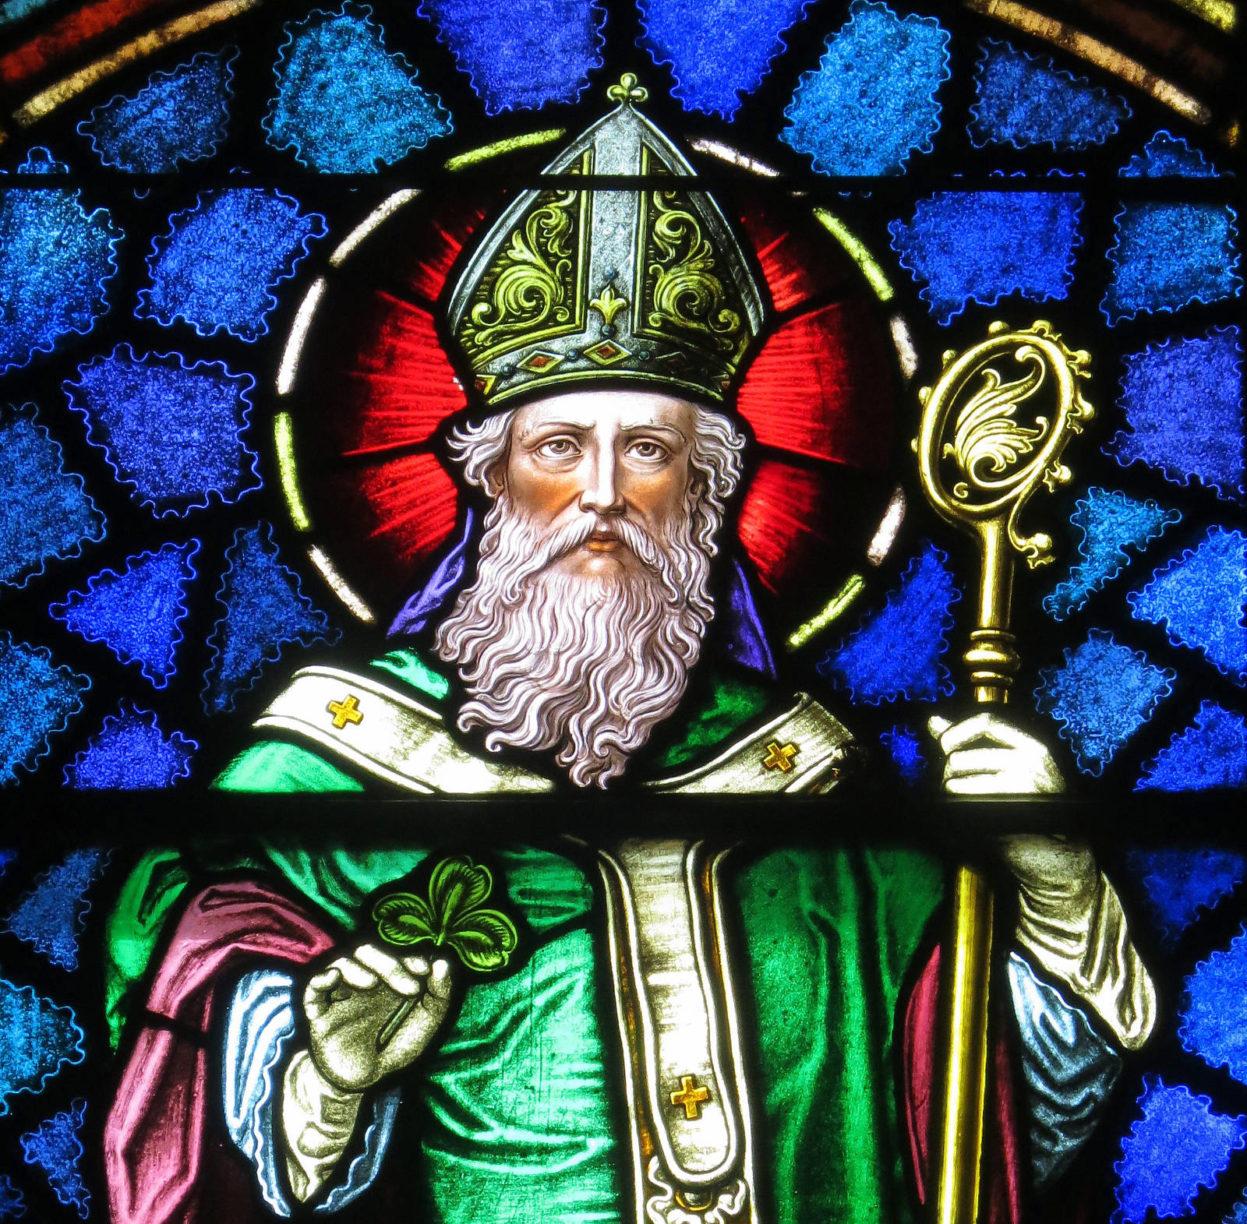 St. Patrick Foto https://commons.wikimedia.org/wiki/Category:Saint_Patrick#/media/File:Saint_Patrick_Catholic_Church_(Junction_City,_Ohio)_-_stained_glass,_Saint_Patrick_-_detail.jpg